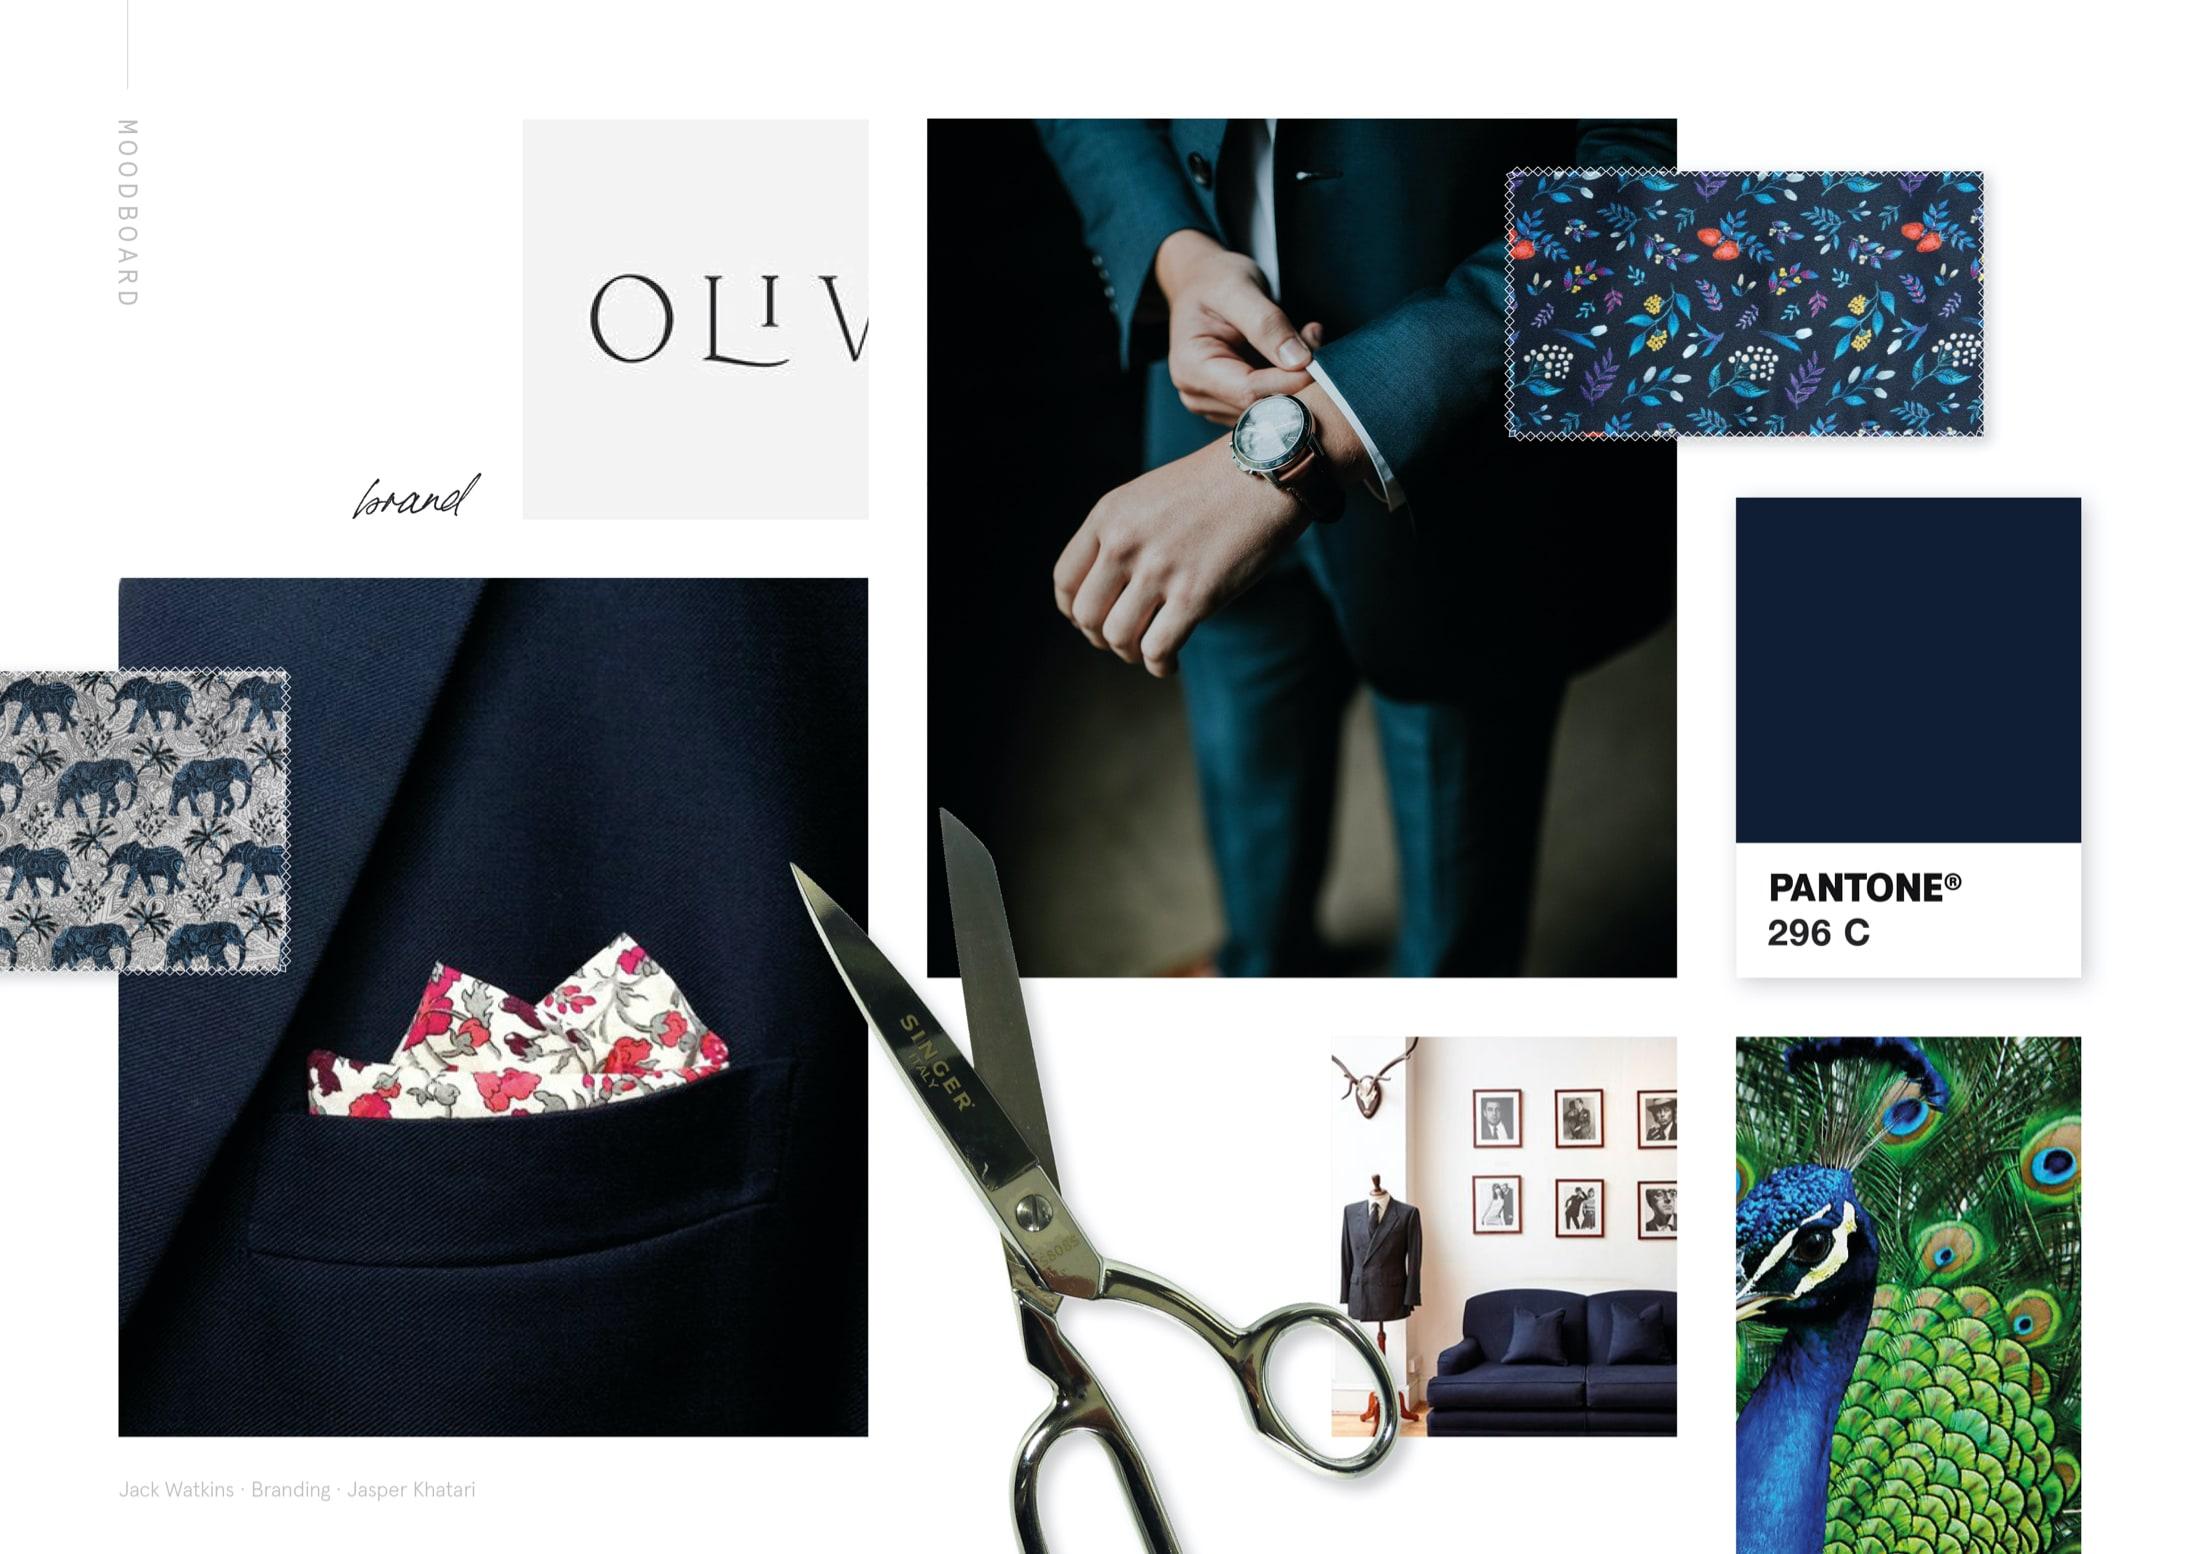 Moodboard curation for Savile Row tailor, Jasper Khatari